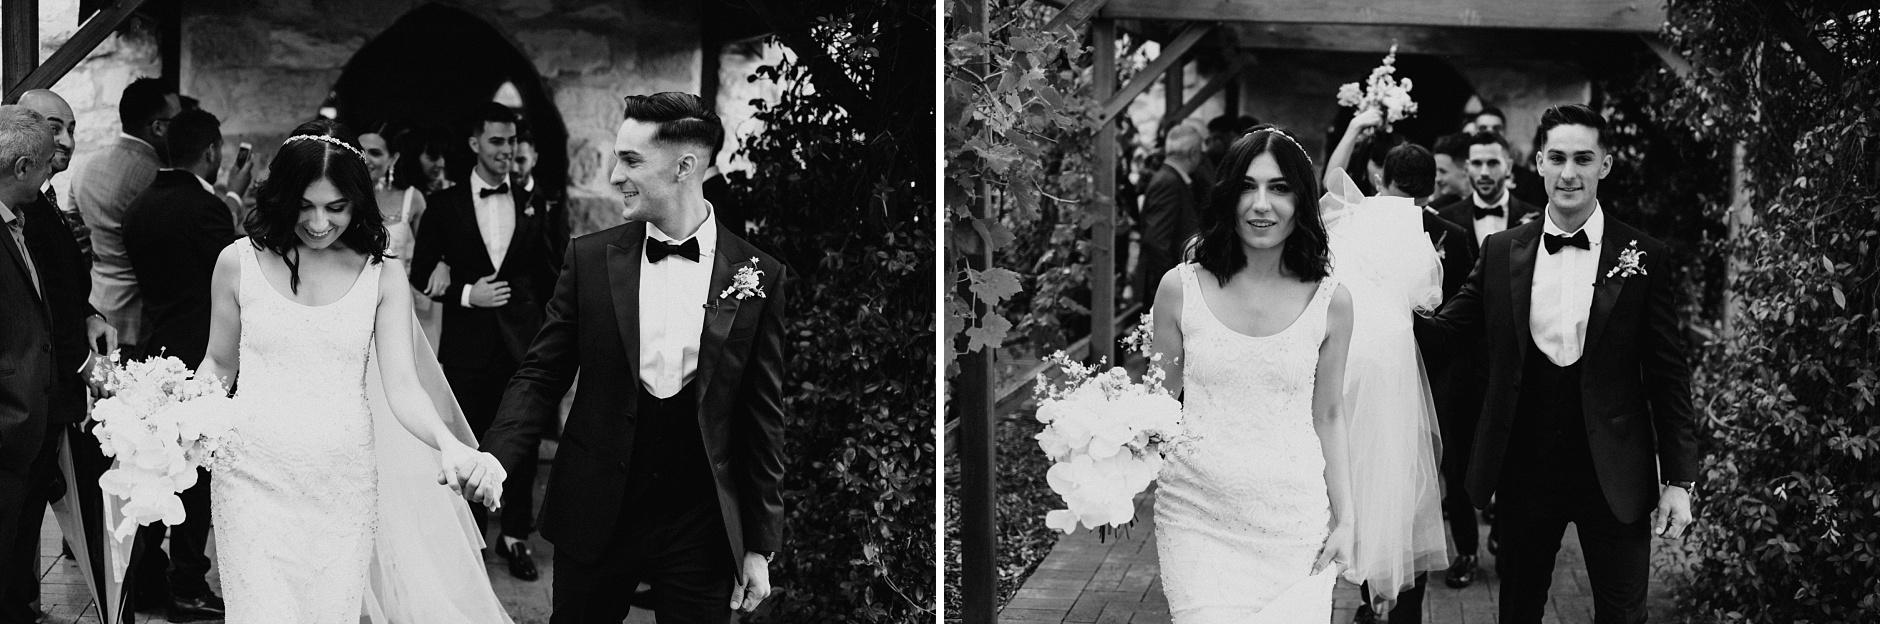 cassandra&cameron0505ab_Peppers-Creek-Wedding.jpg